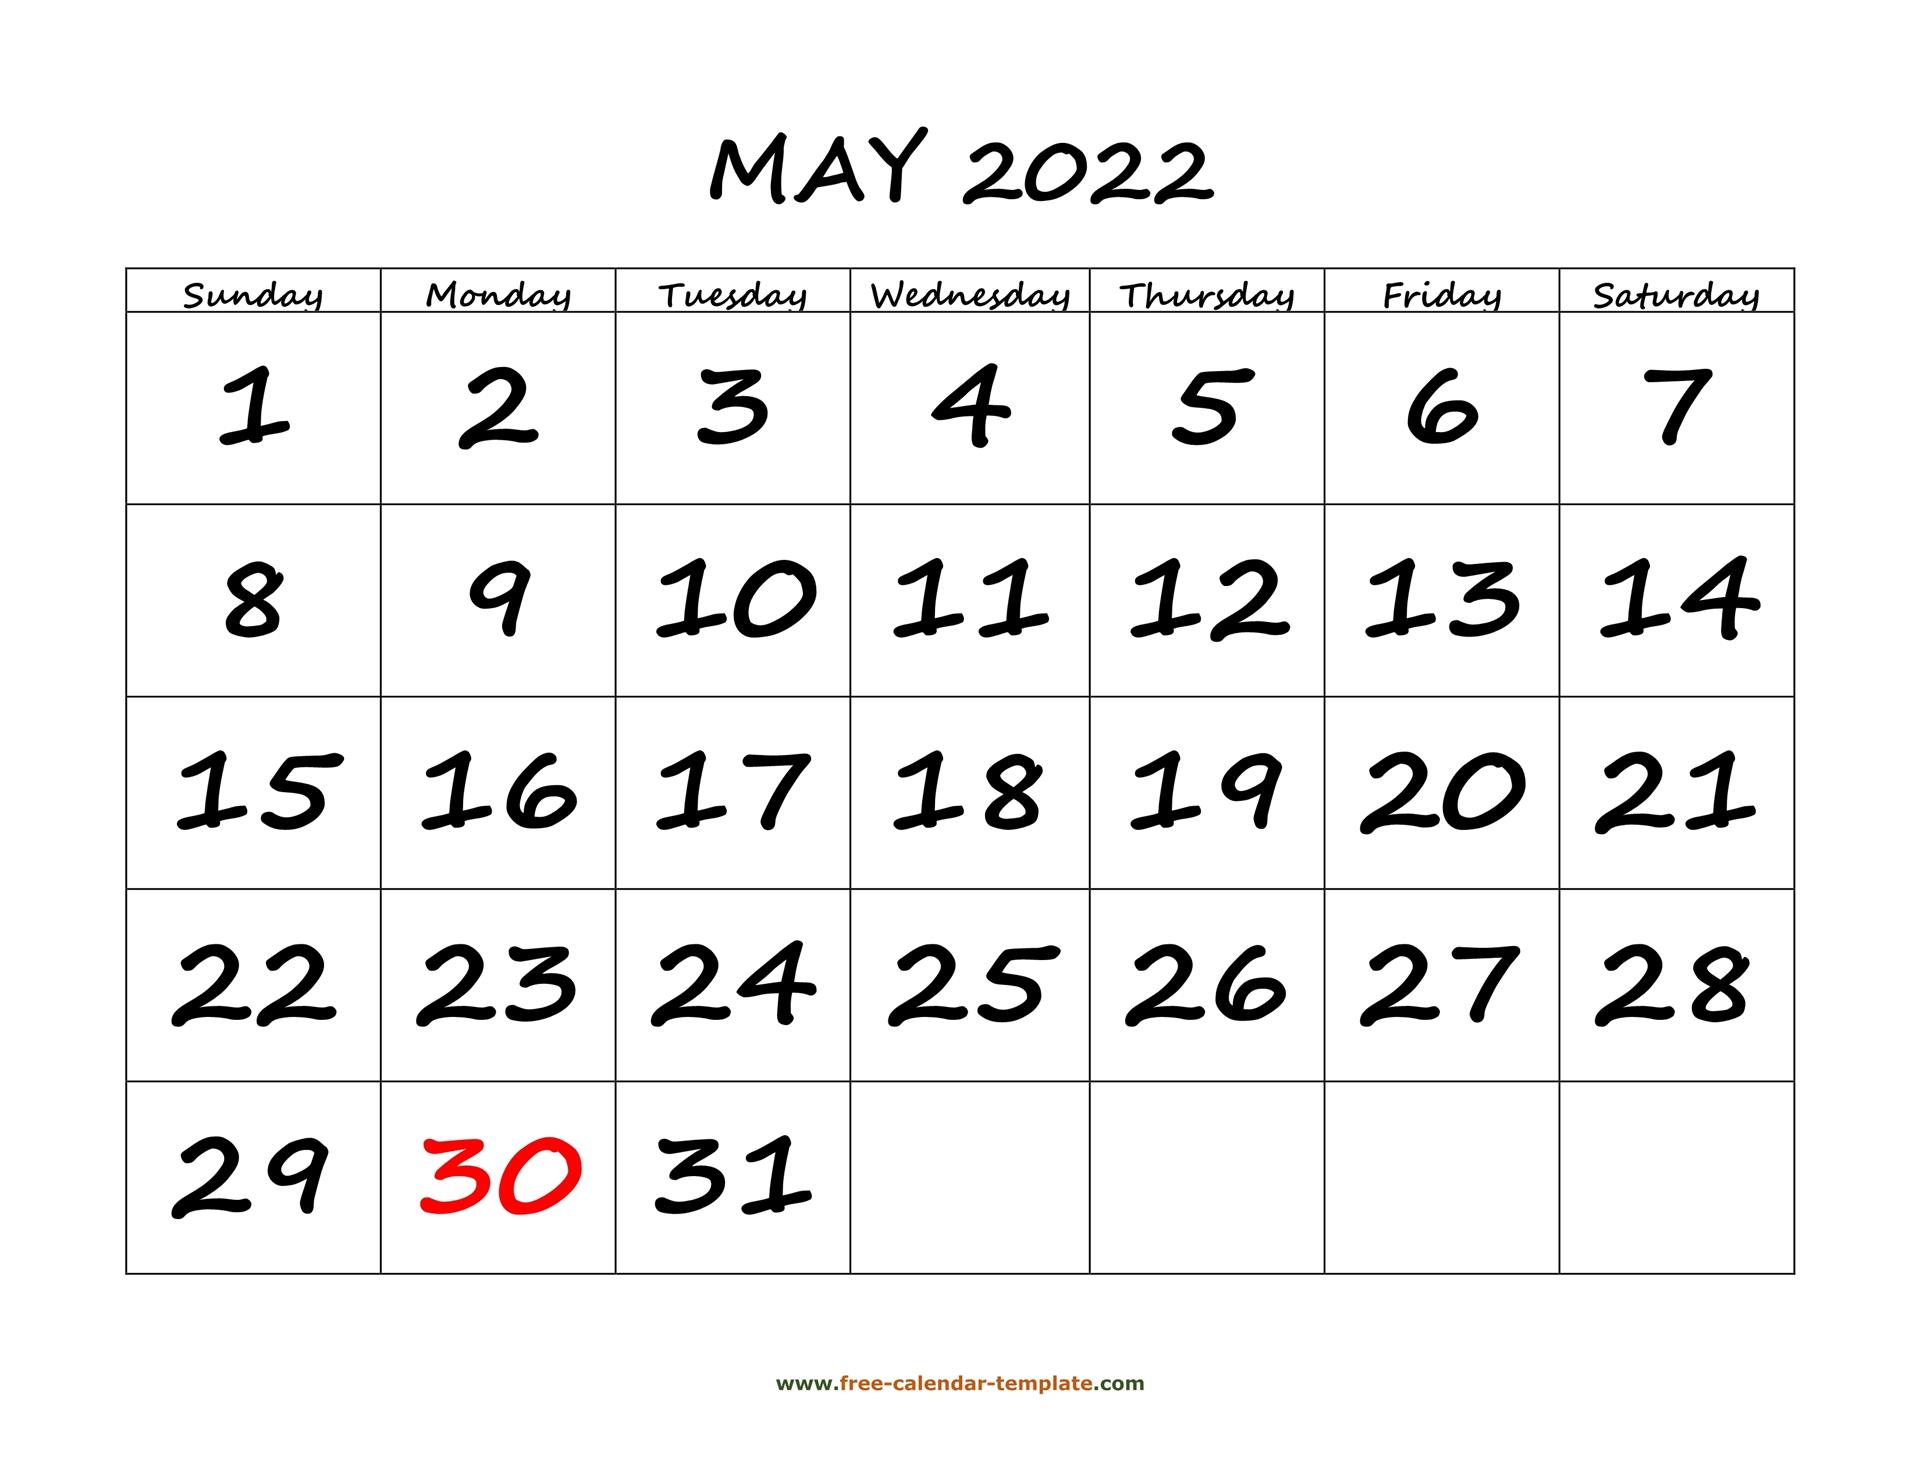 May 2022 Free Calendar Tempplate   Free Calendar Template Pertaining To Full Page January 2022 Calendar